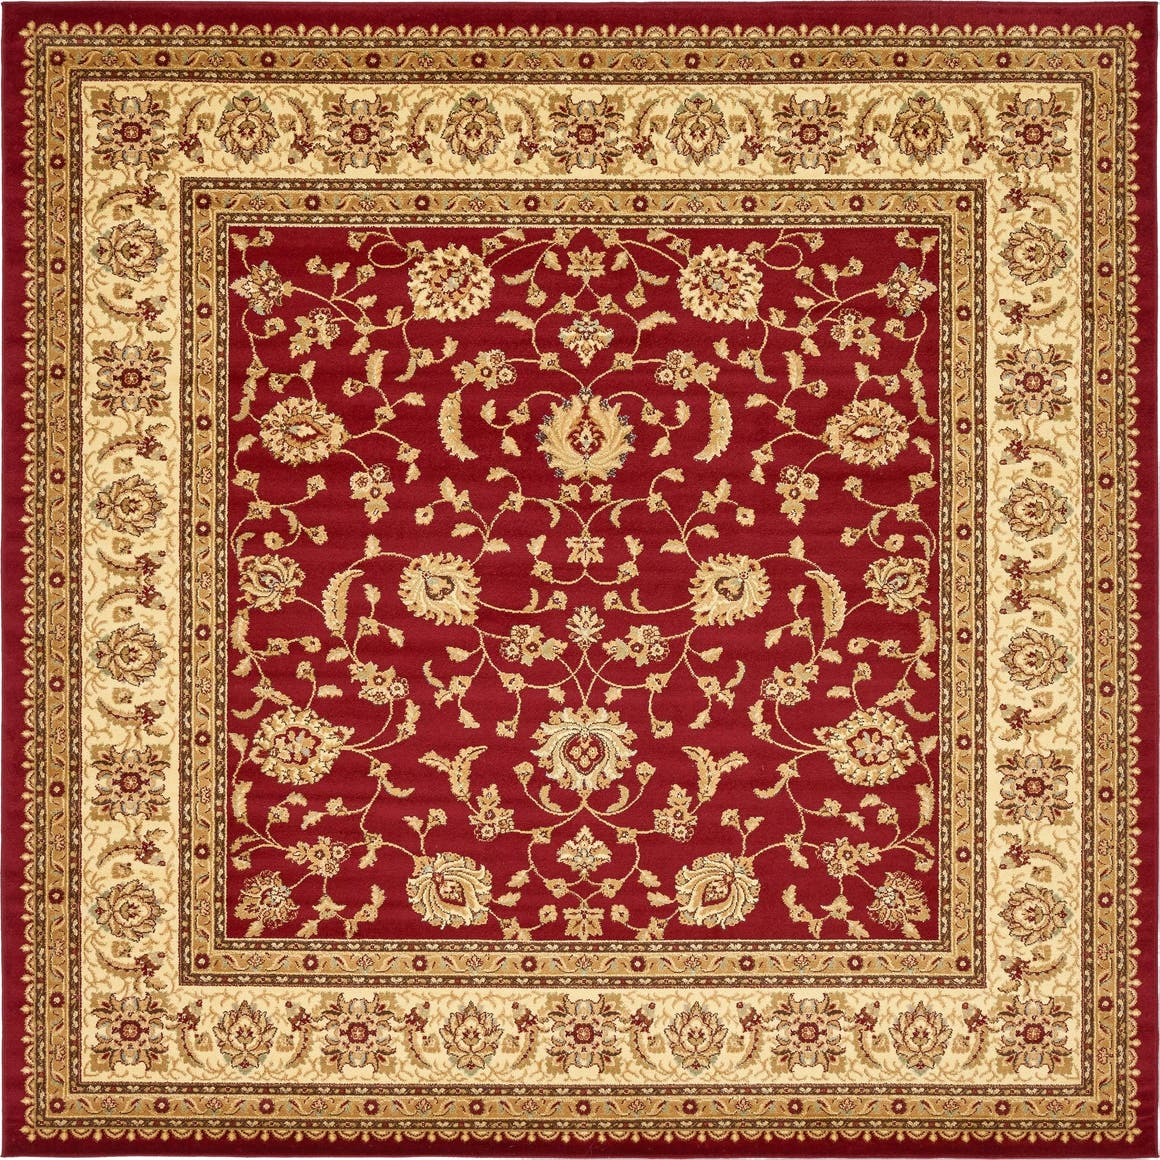 10' x 10' Classic Agra Square Rug main image